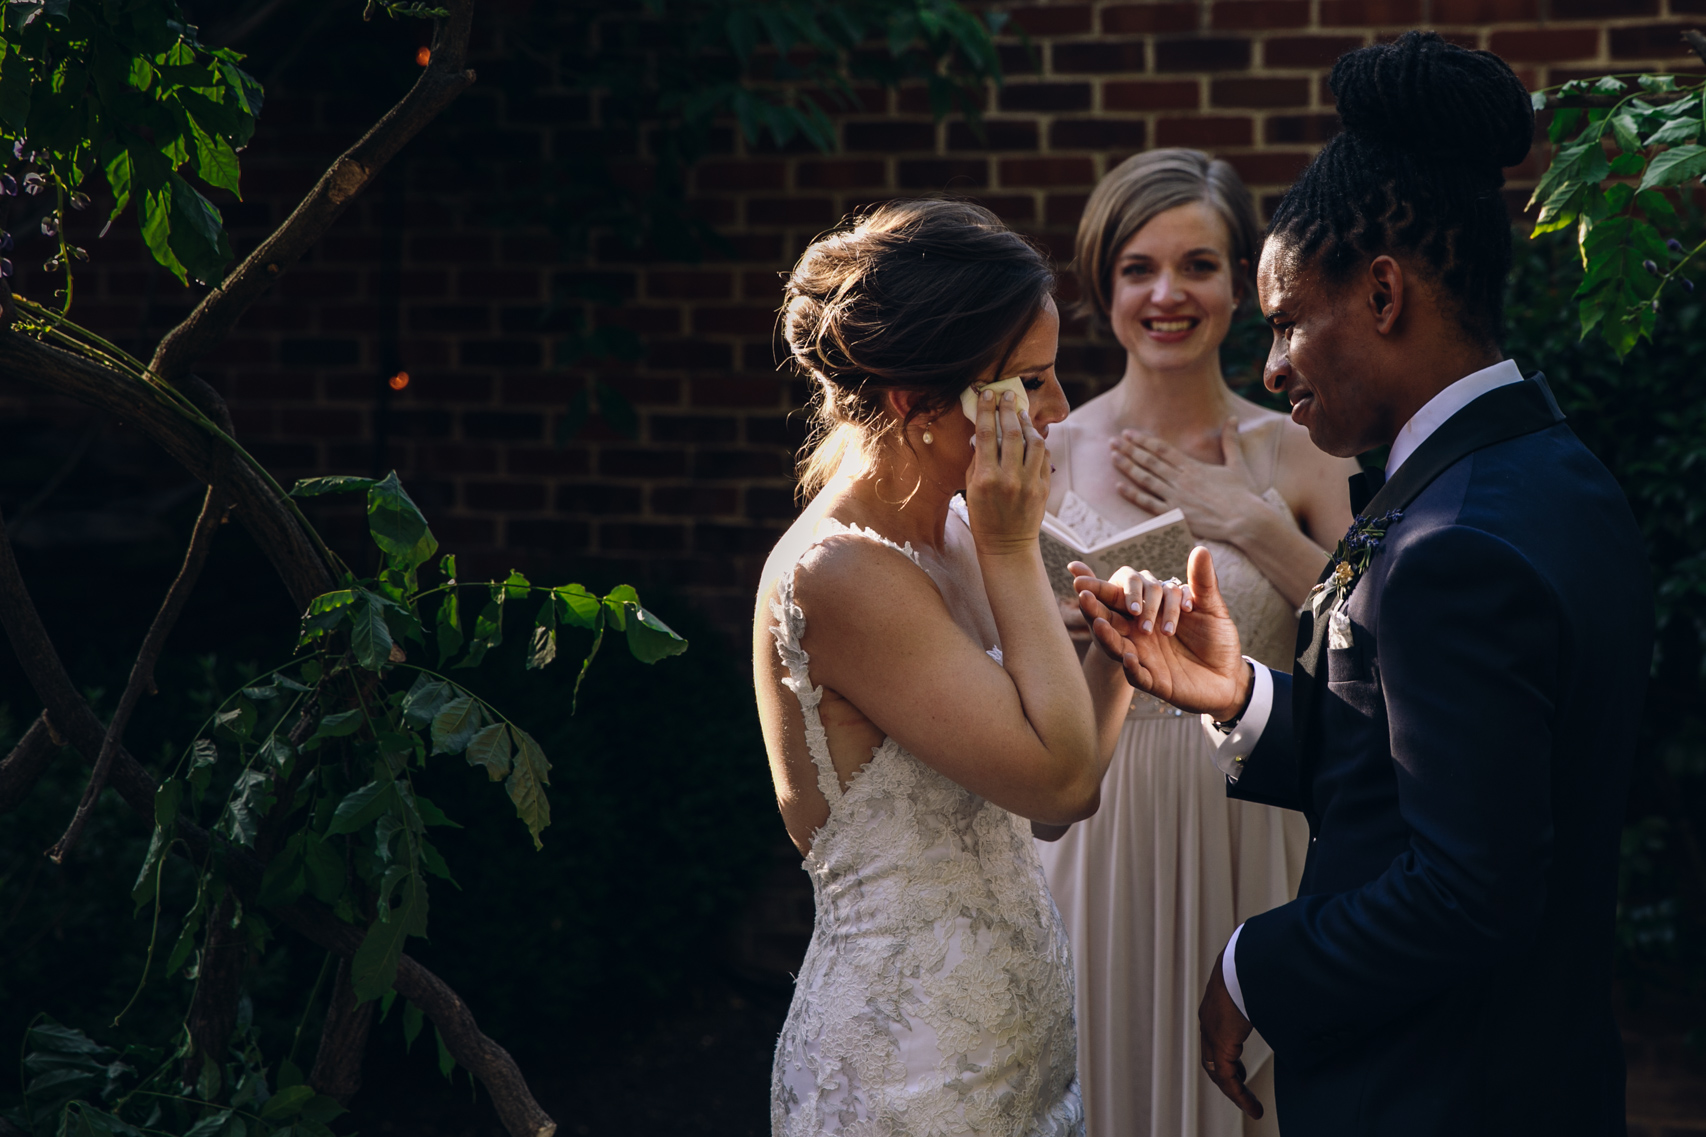 Wedding Ceremony at the Ritz Carlton, Georgetown, Washington DC